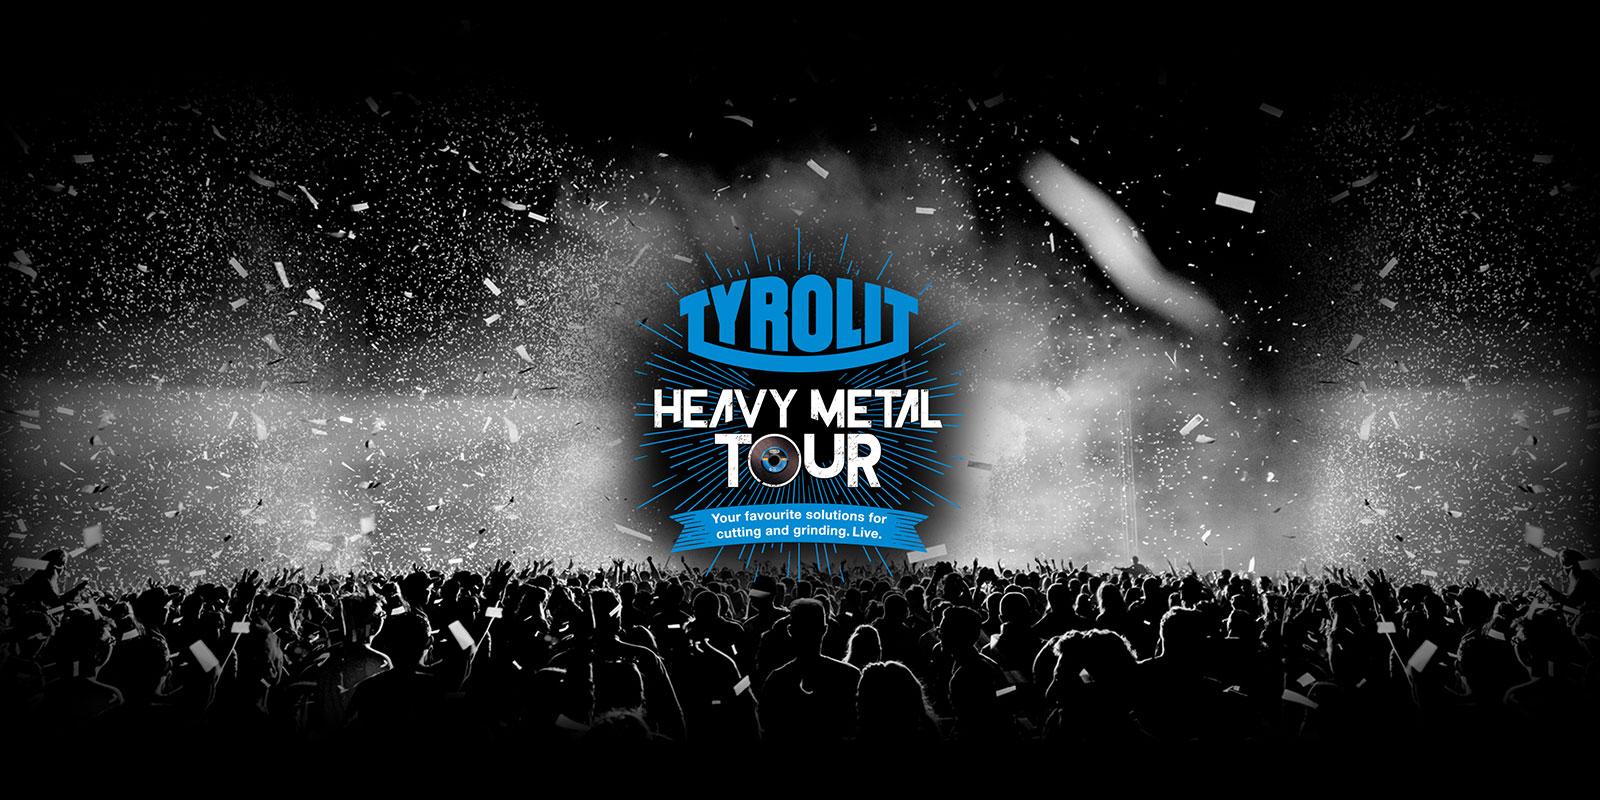 heavy metal dating Irland